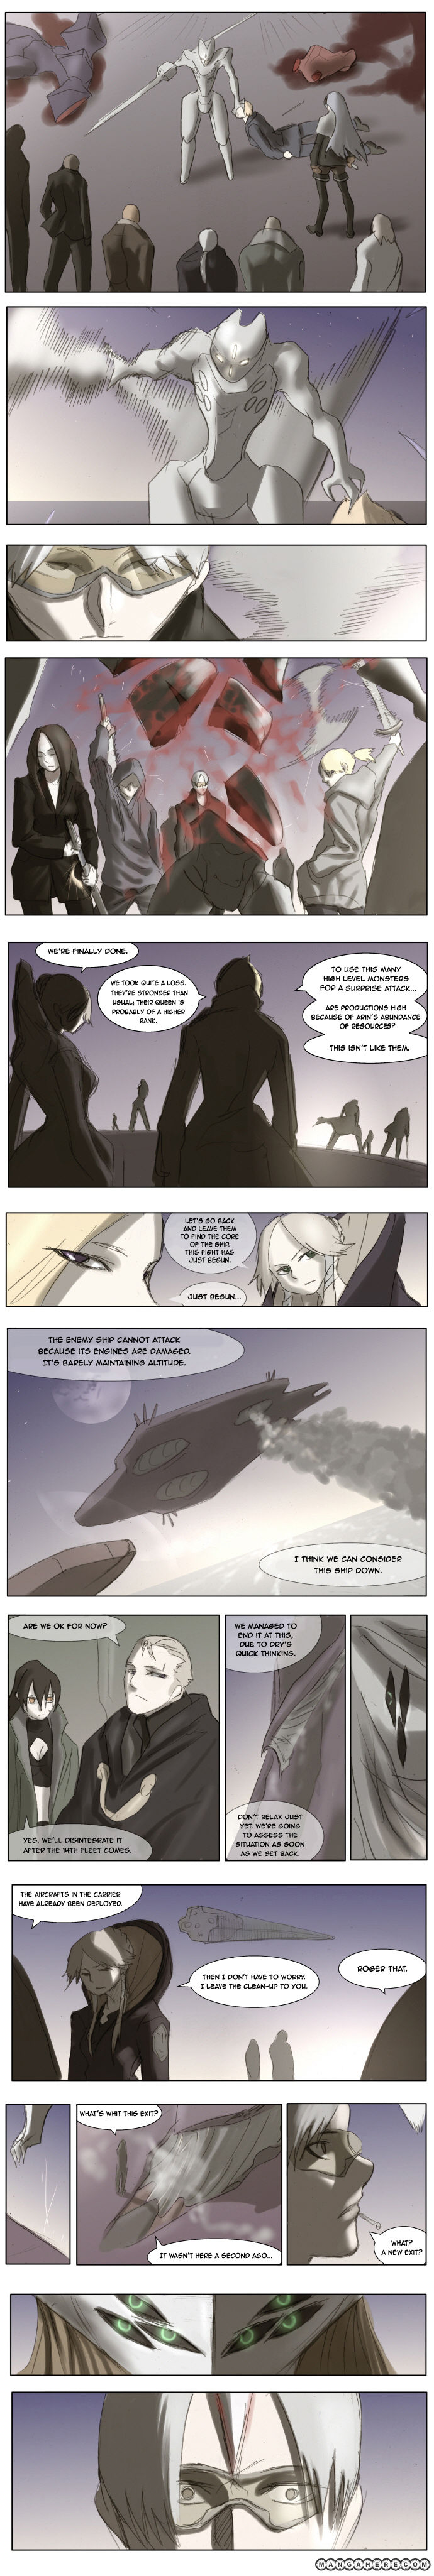 Knight Run 20 Page 2